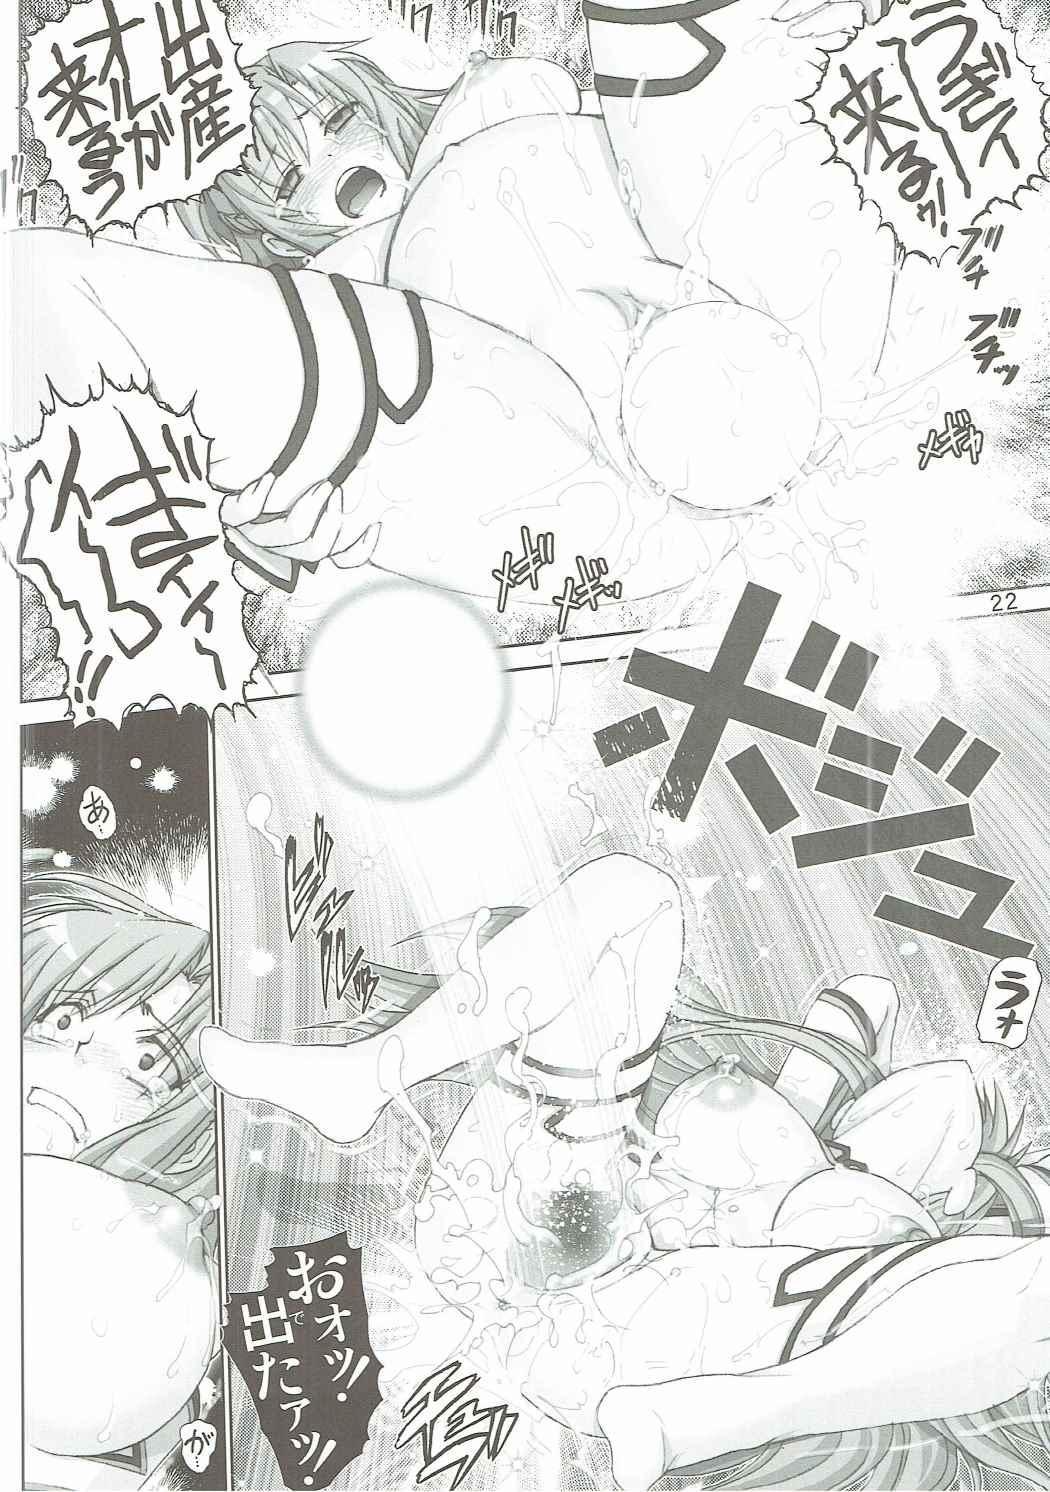 Sword Tsuma Asuna - The wife equipped with a sword, ASUNA 20